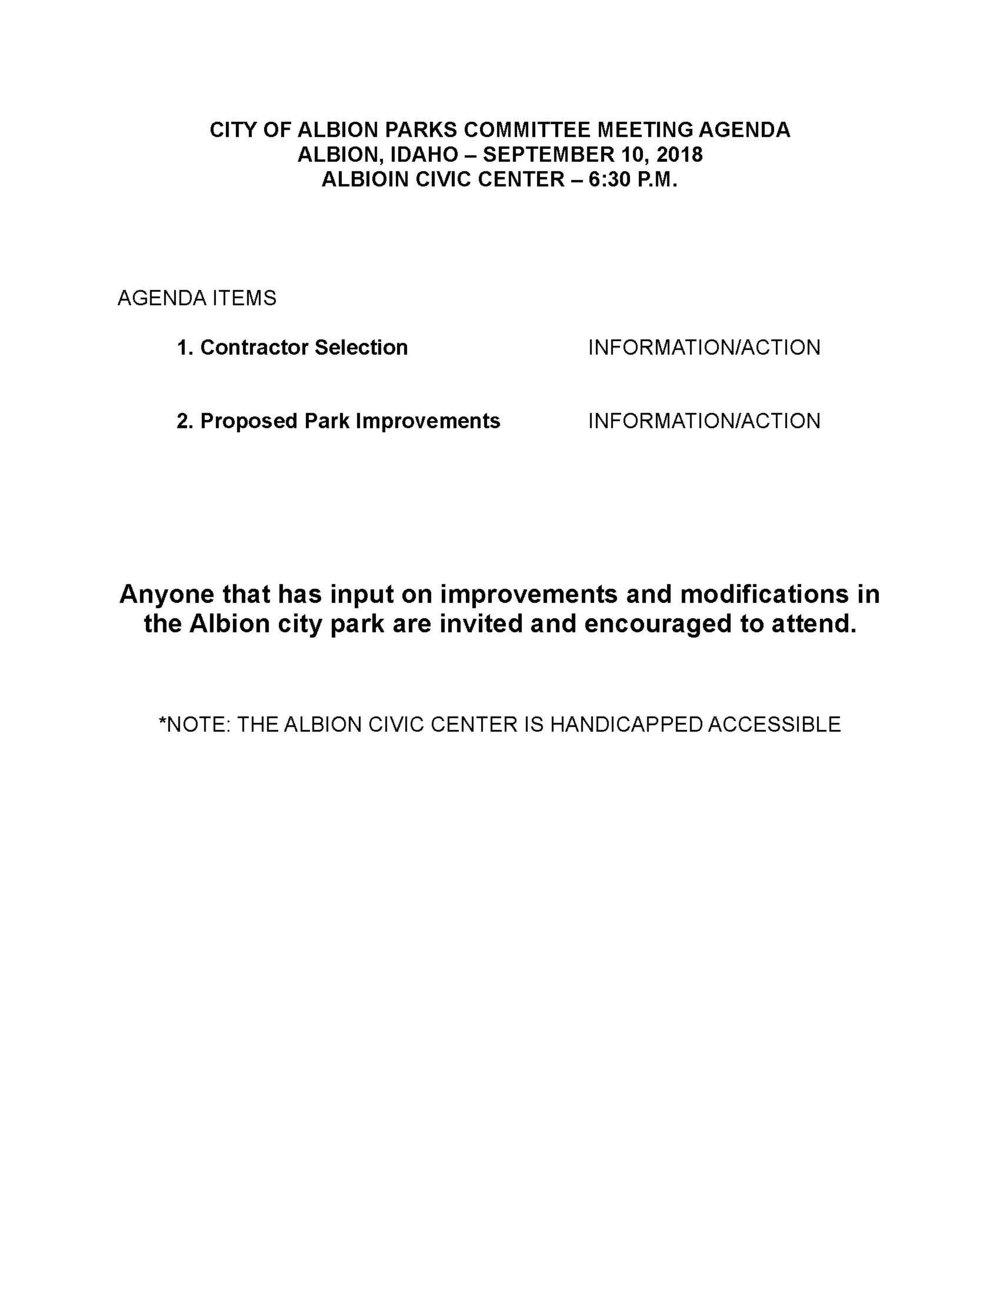 Parks Committee Agenda 9.10.18.jpg